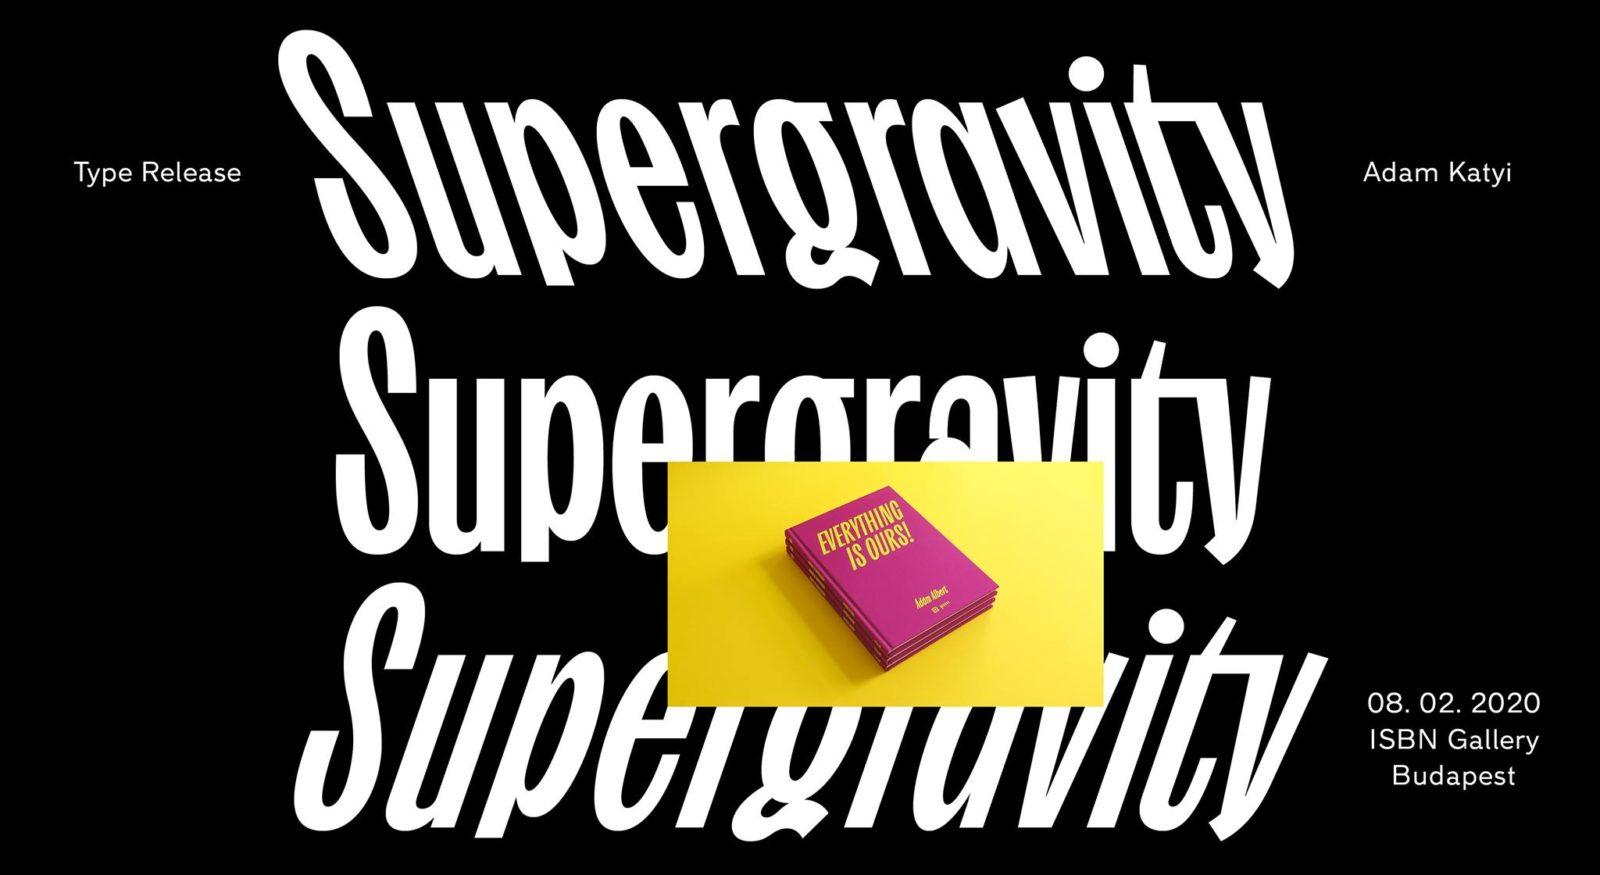 Supergravity – Katyi Ádám